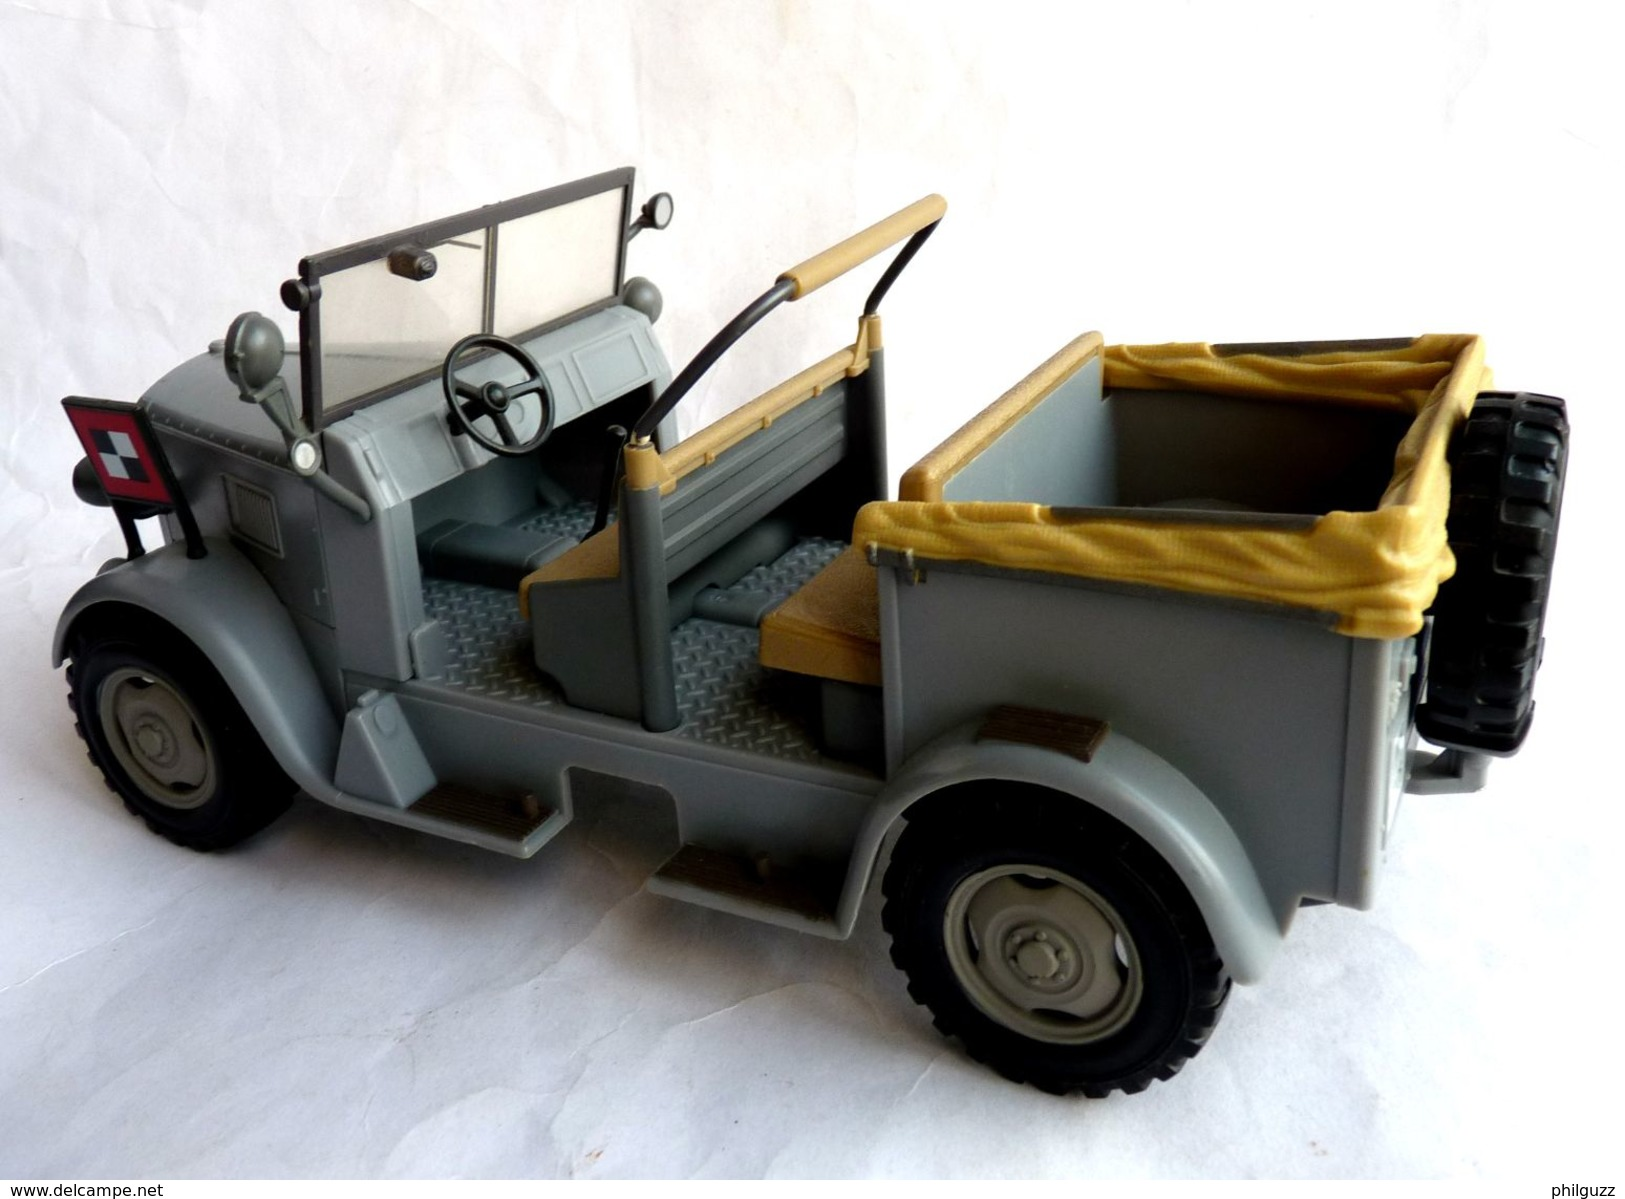 INDIANA JONES - RAIDERS OF THE LOST ARK - HASBRO 2008 - CAMION TROOP CAR WH WW2 - Figurines